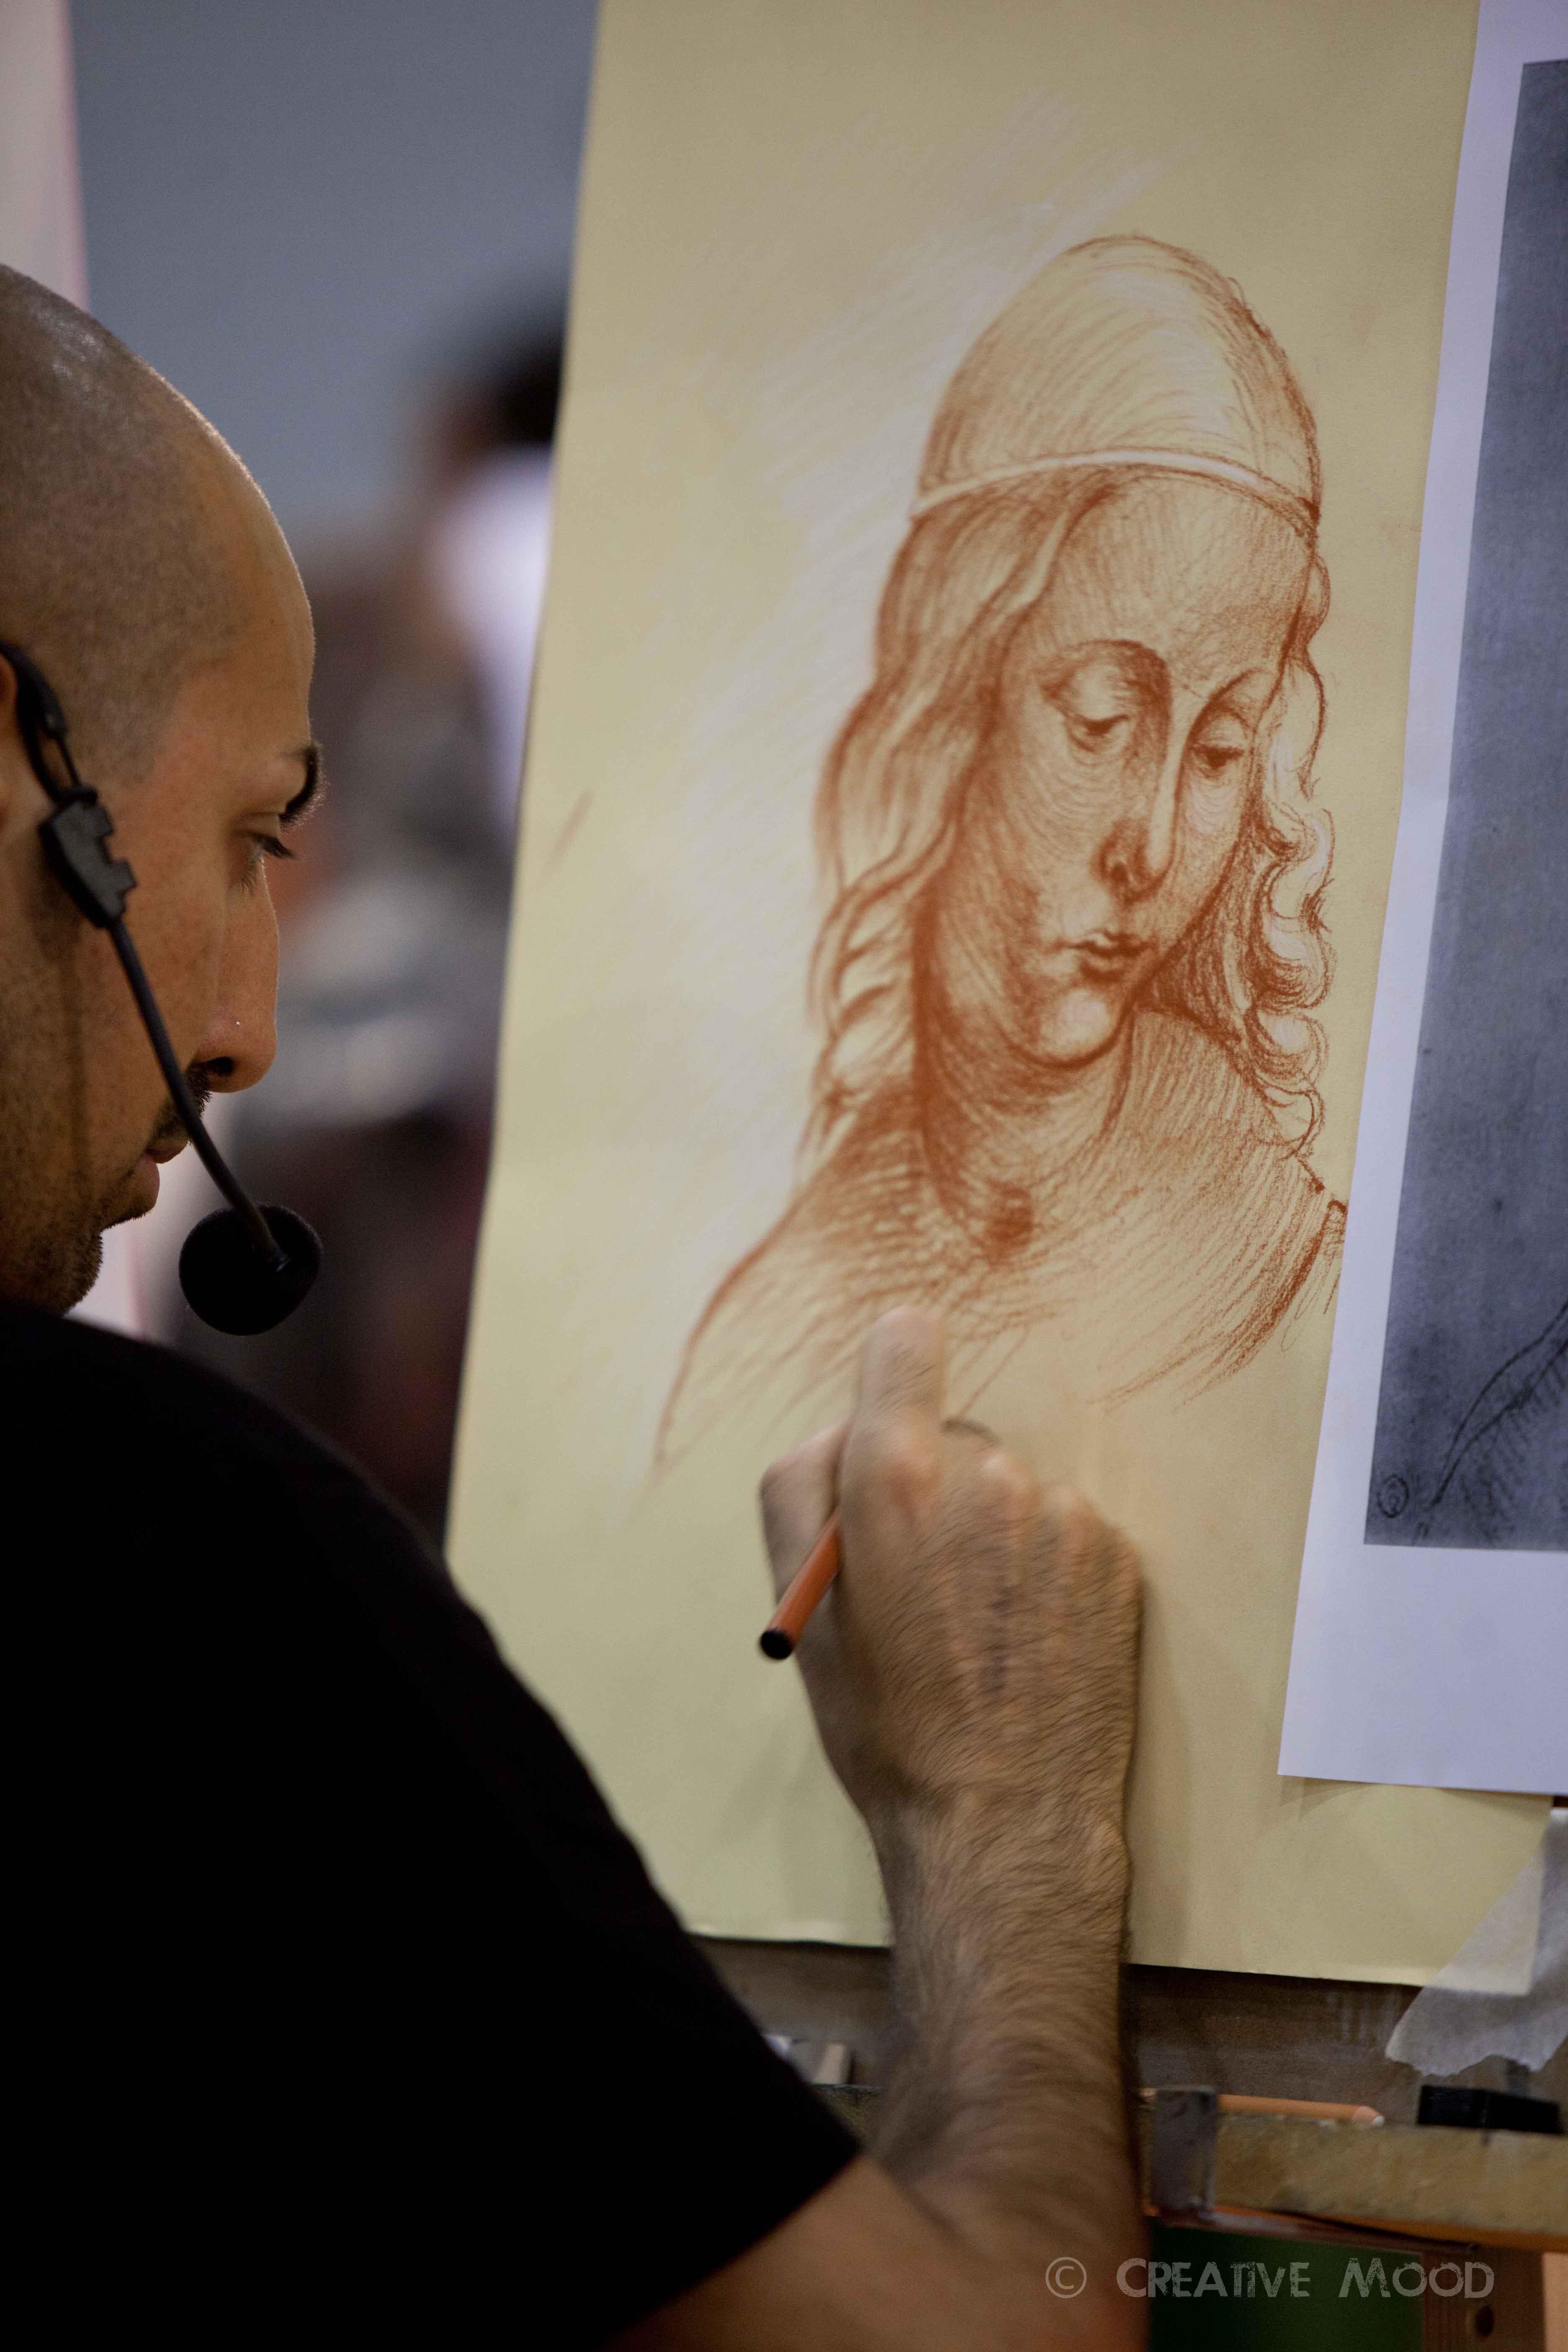 officina d'arte Hobby show fiera di roma-45.jpg